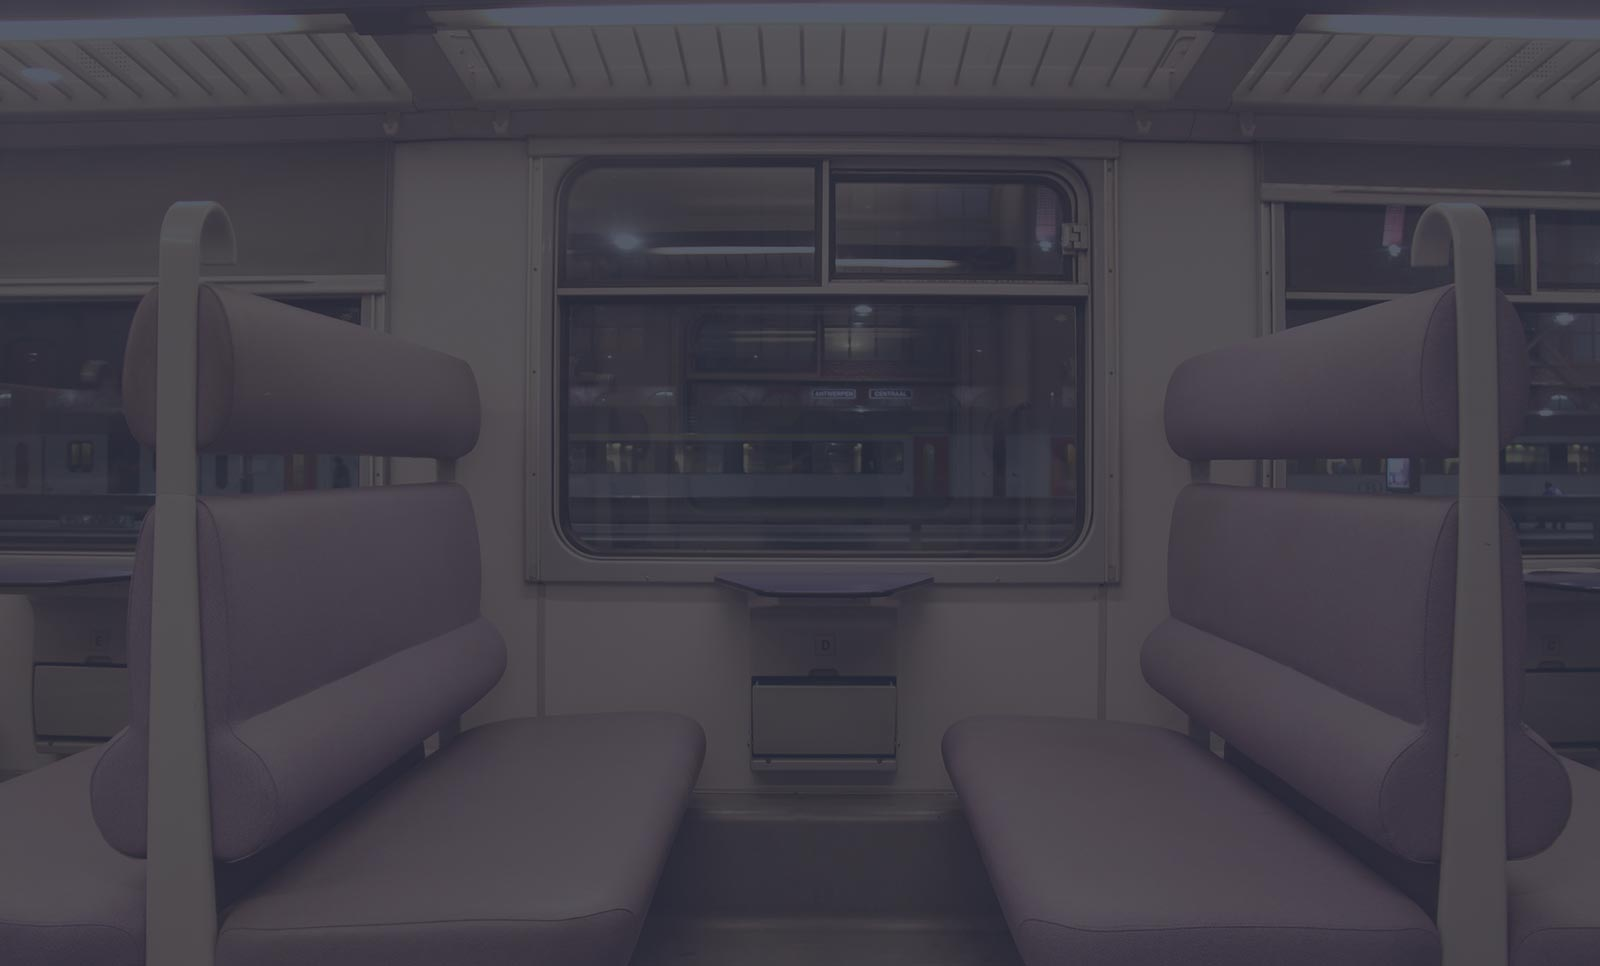 mass-transit-window-tinting-in-denver